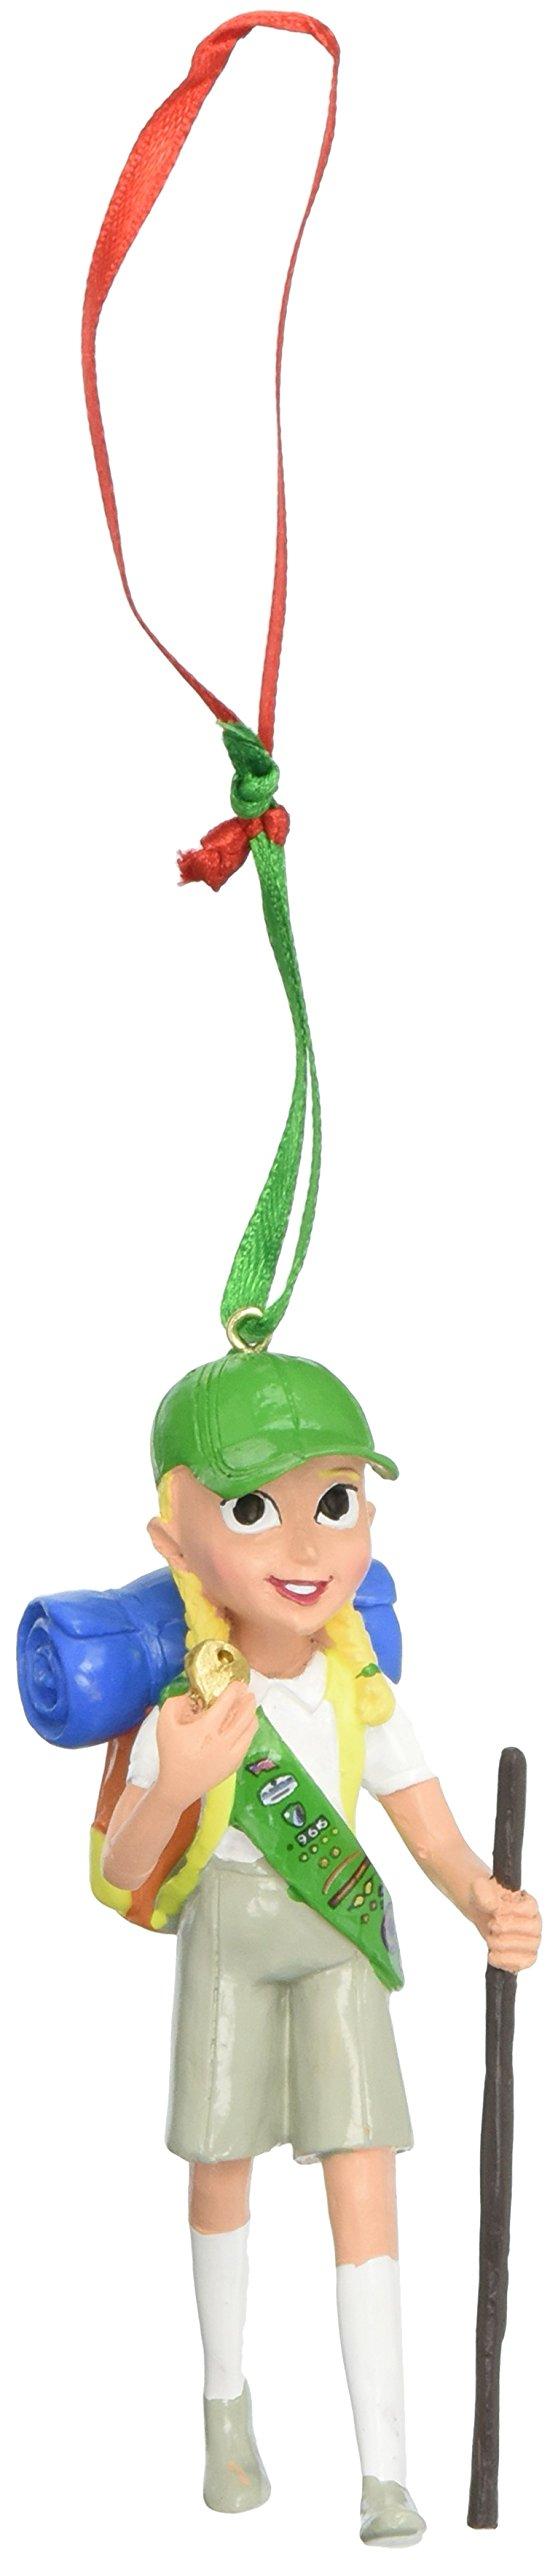 Department 56 Girl Scout Junior Camping Hanging Ornament